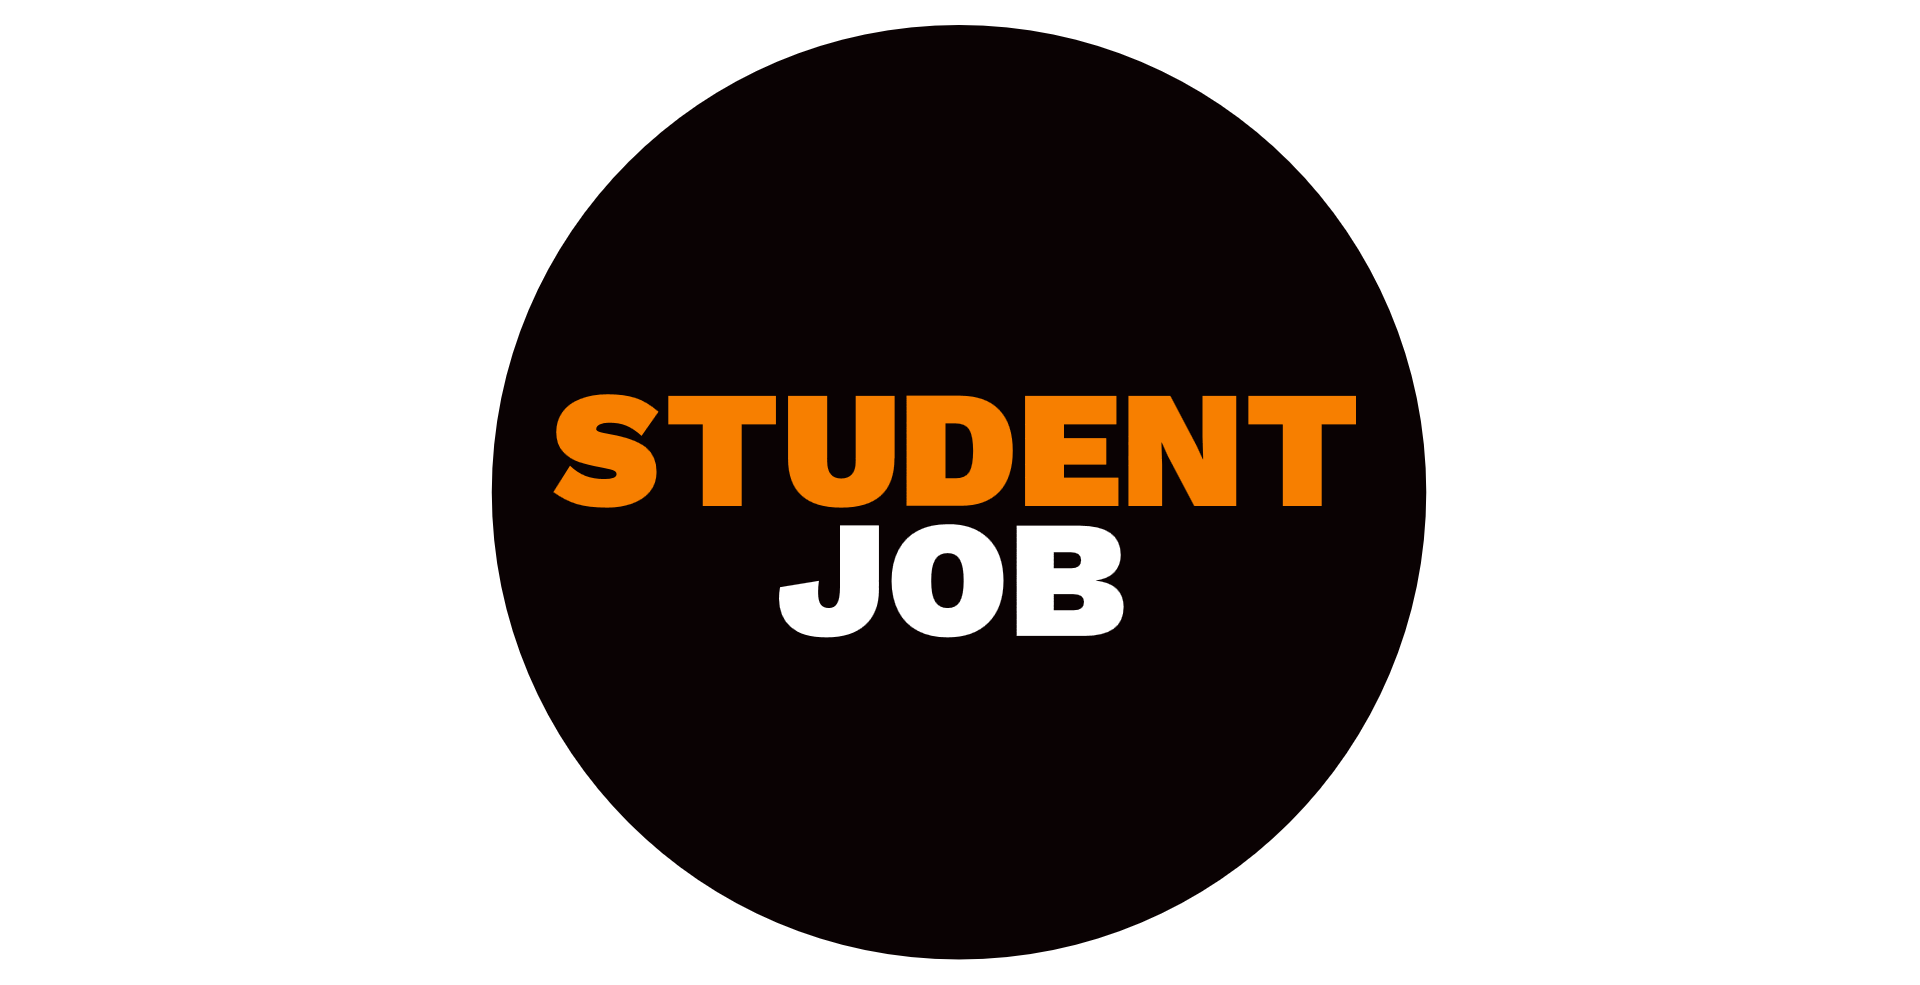 Student Job UK